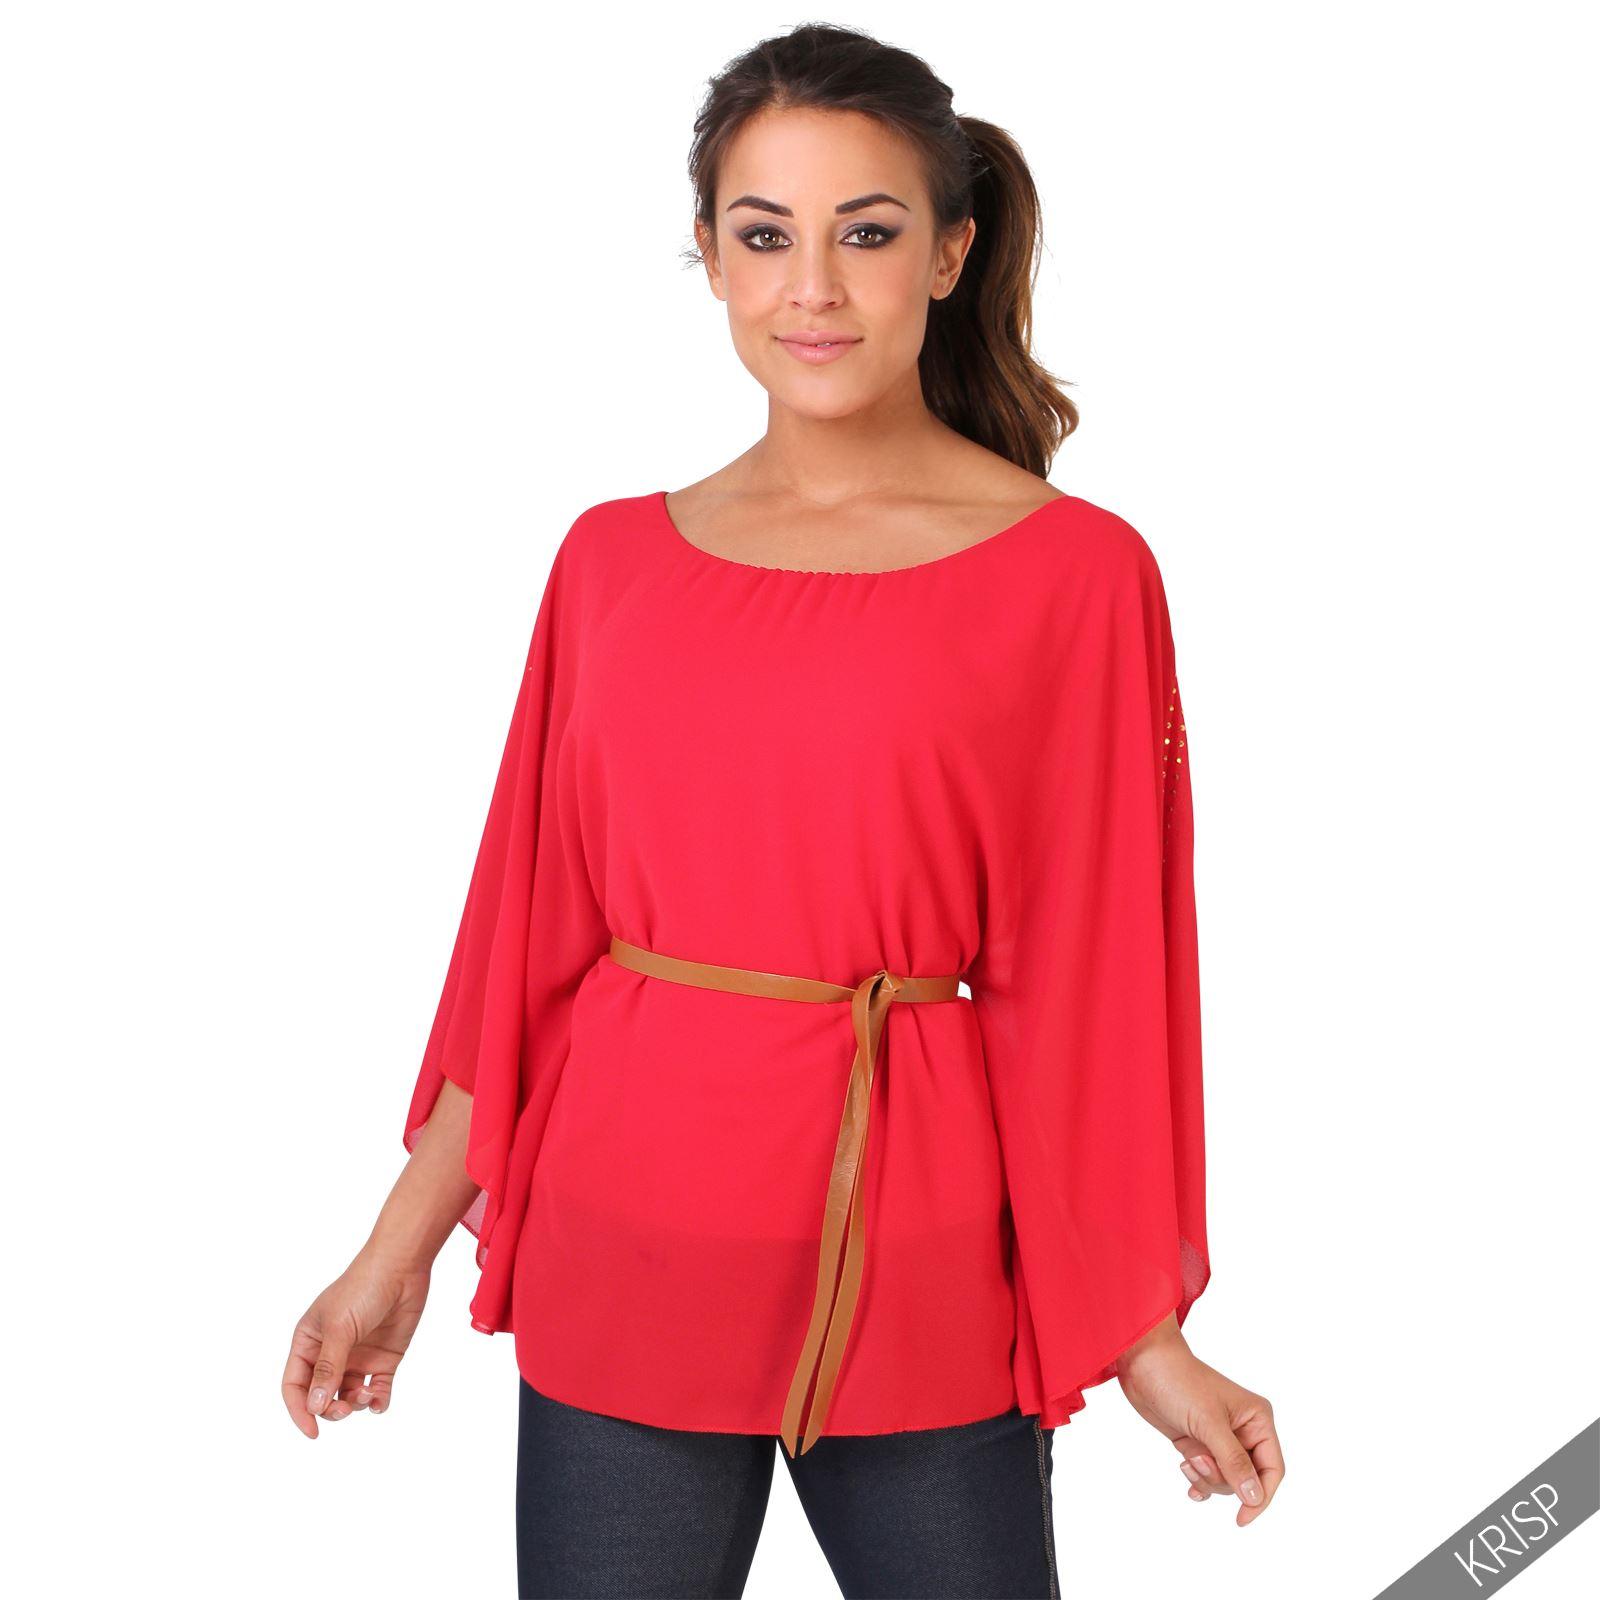 Women Sexy Red Lace Chiffon Bodycon Dress Top Blouse ...